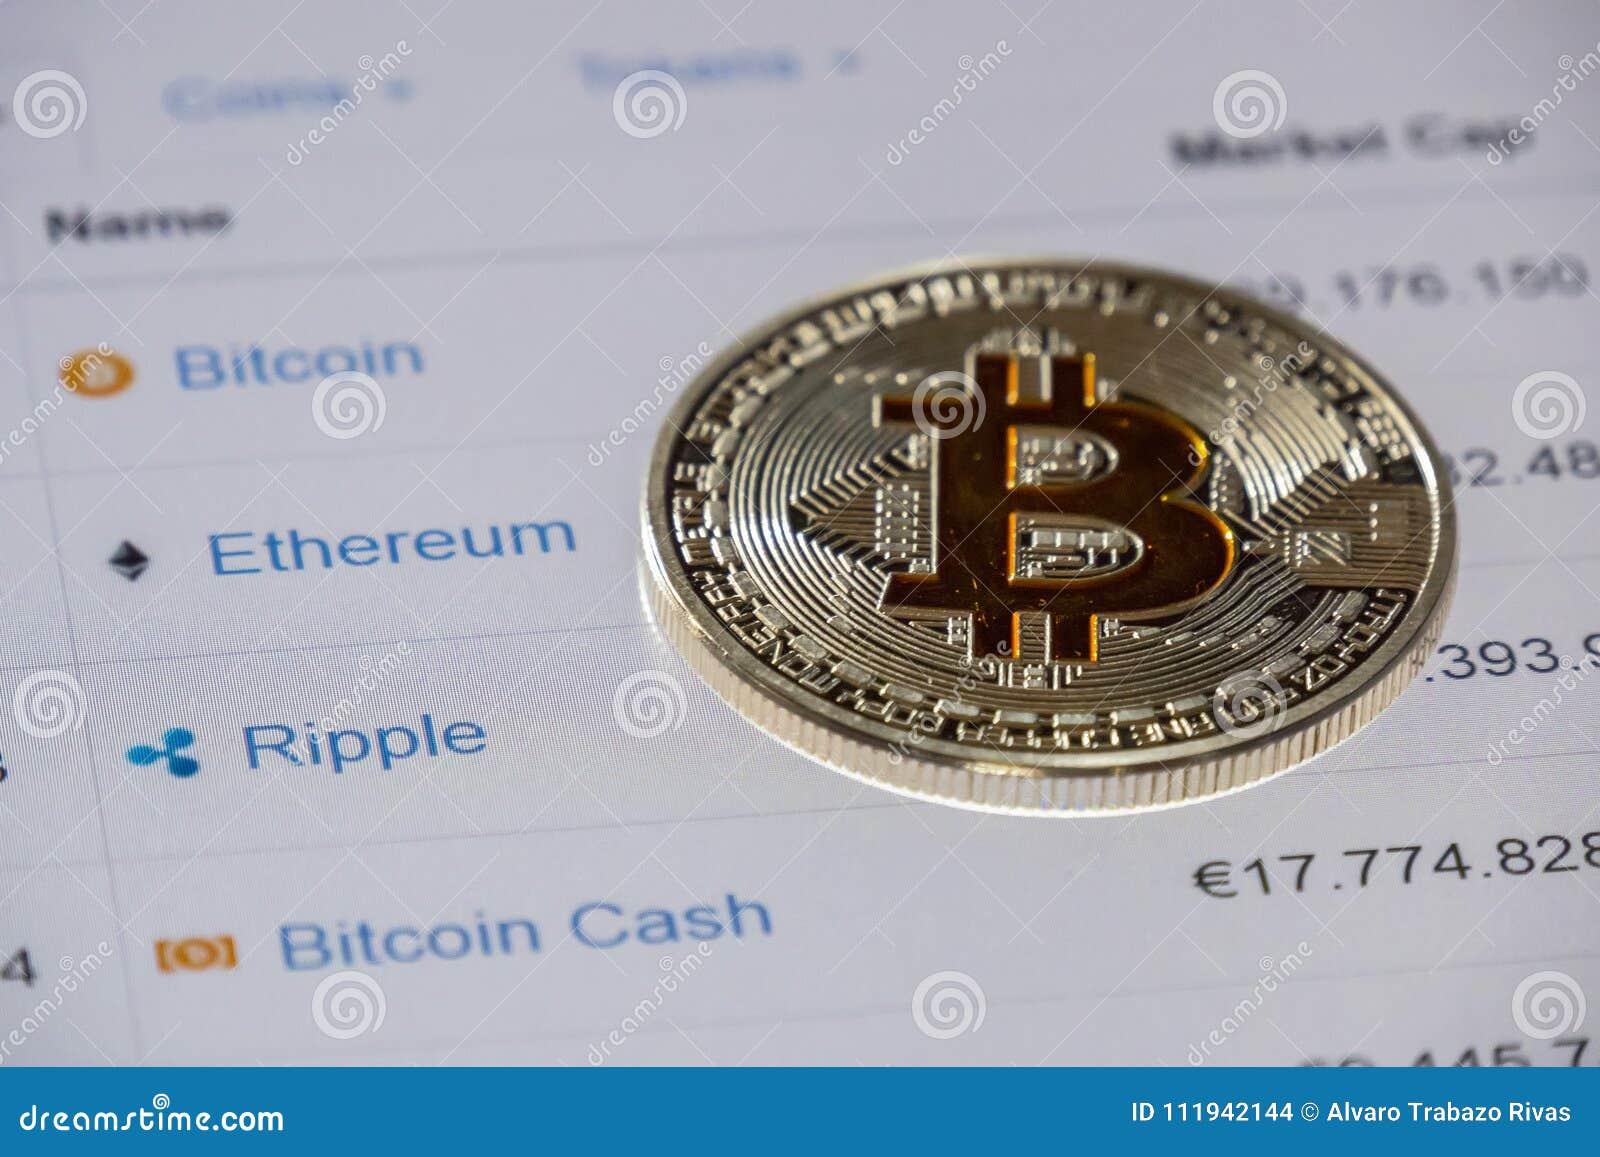 stocks market cap vs cryptocurrency